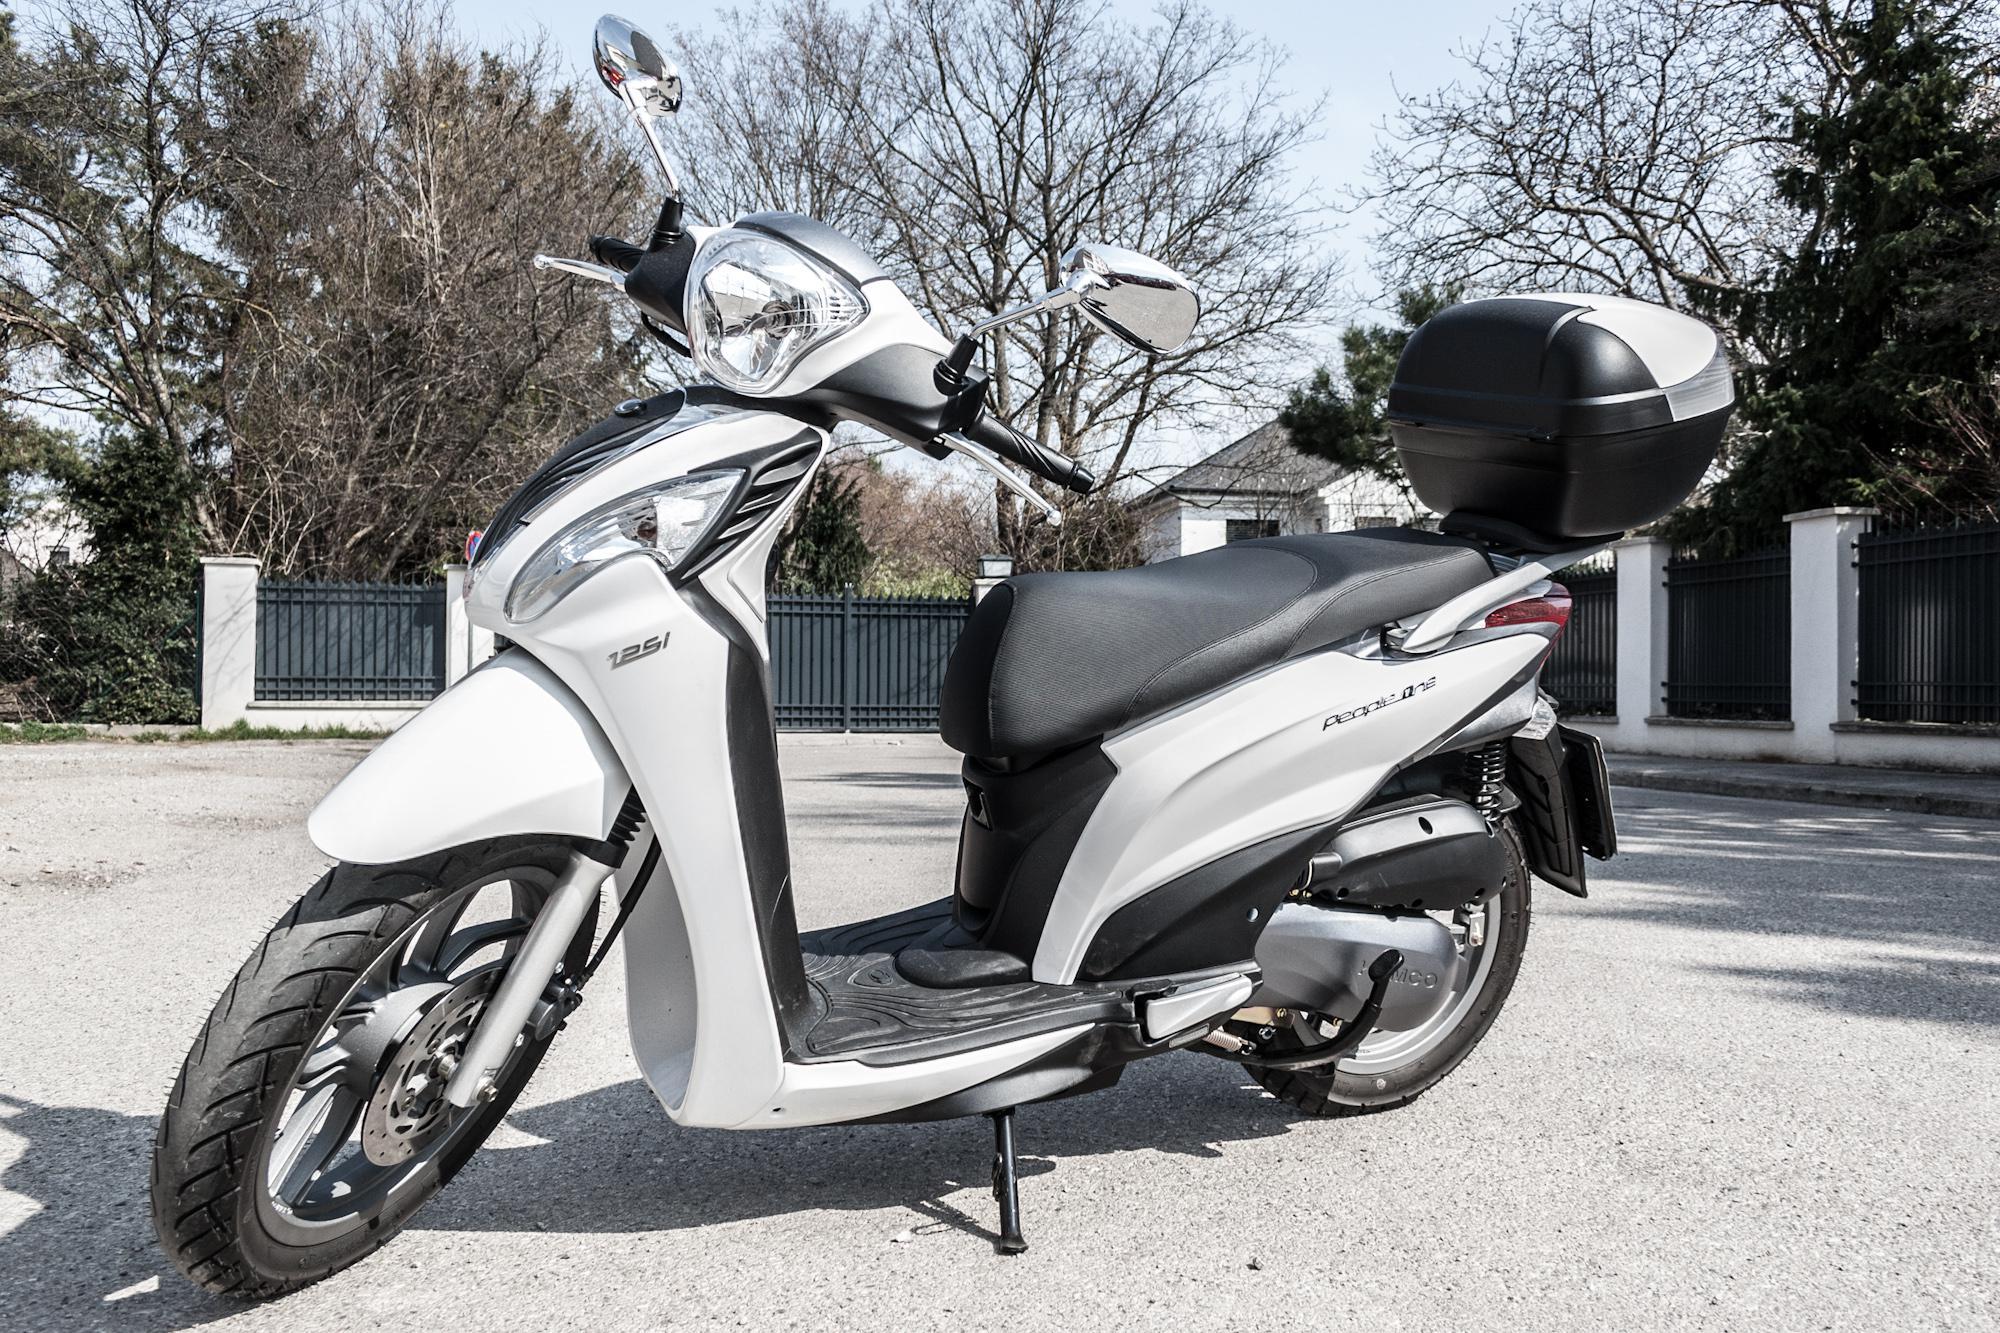 kymco people one 125 test 2015 motorrad fotos motorrad. Black Bedroom Furniture Sets. Home Design Ideas